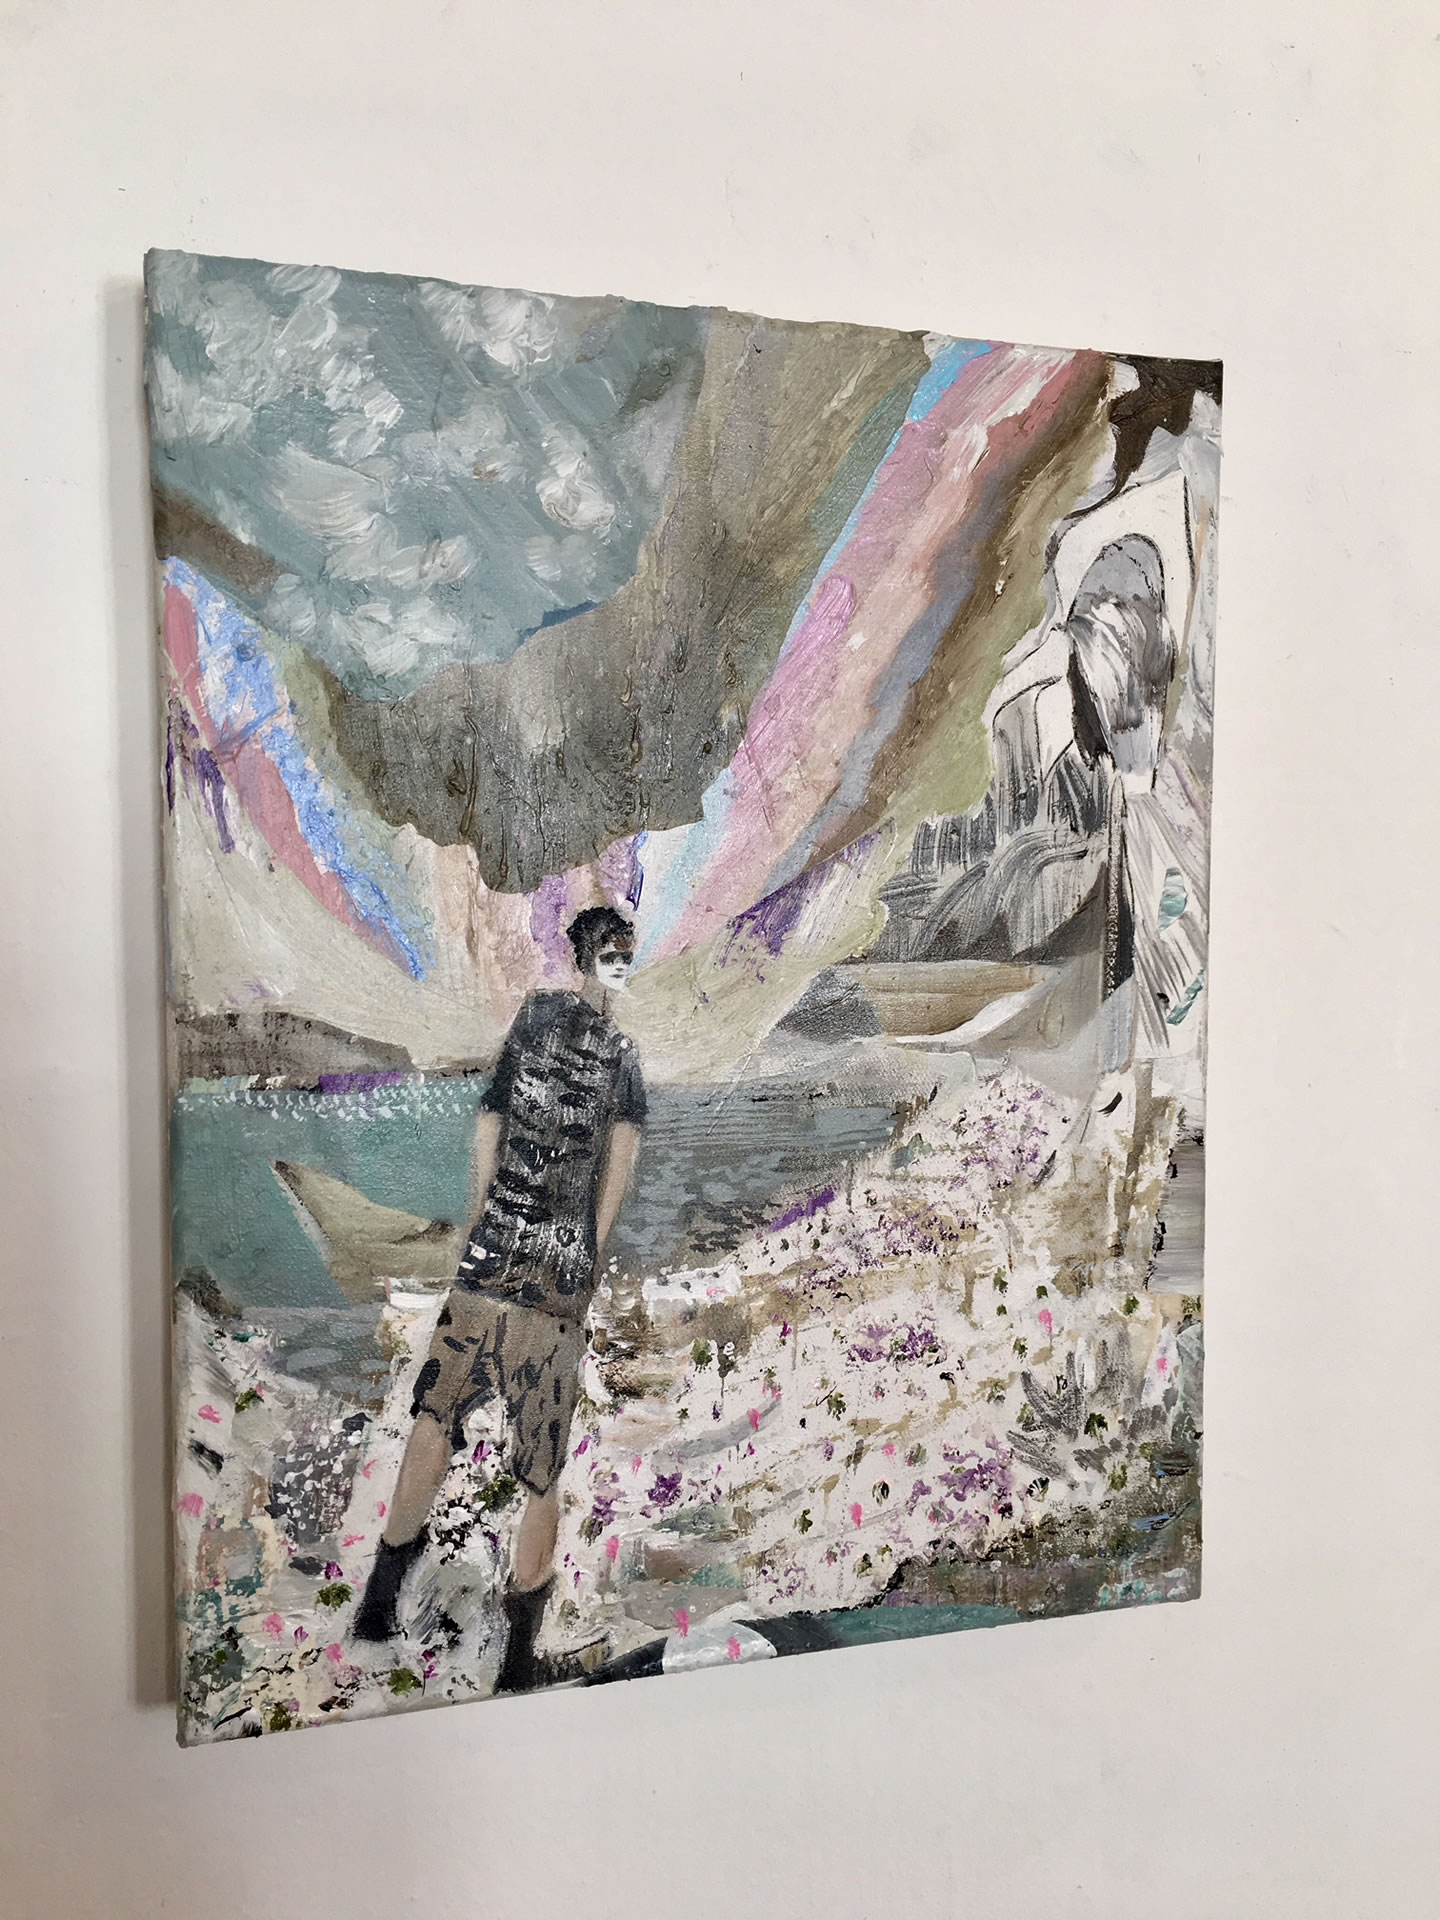 Galerie3 | Kevin A. Rausch